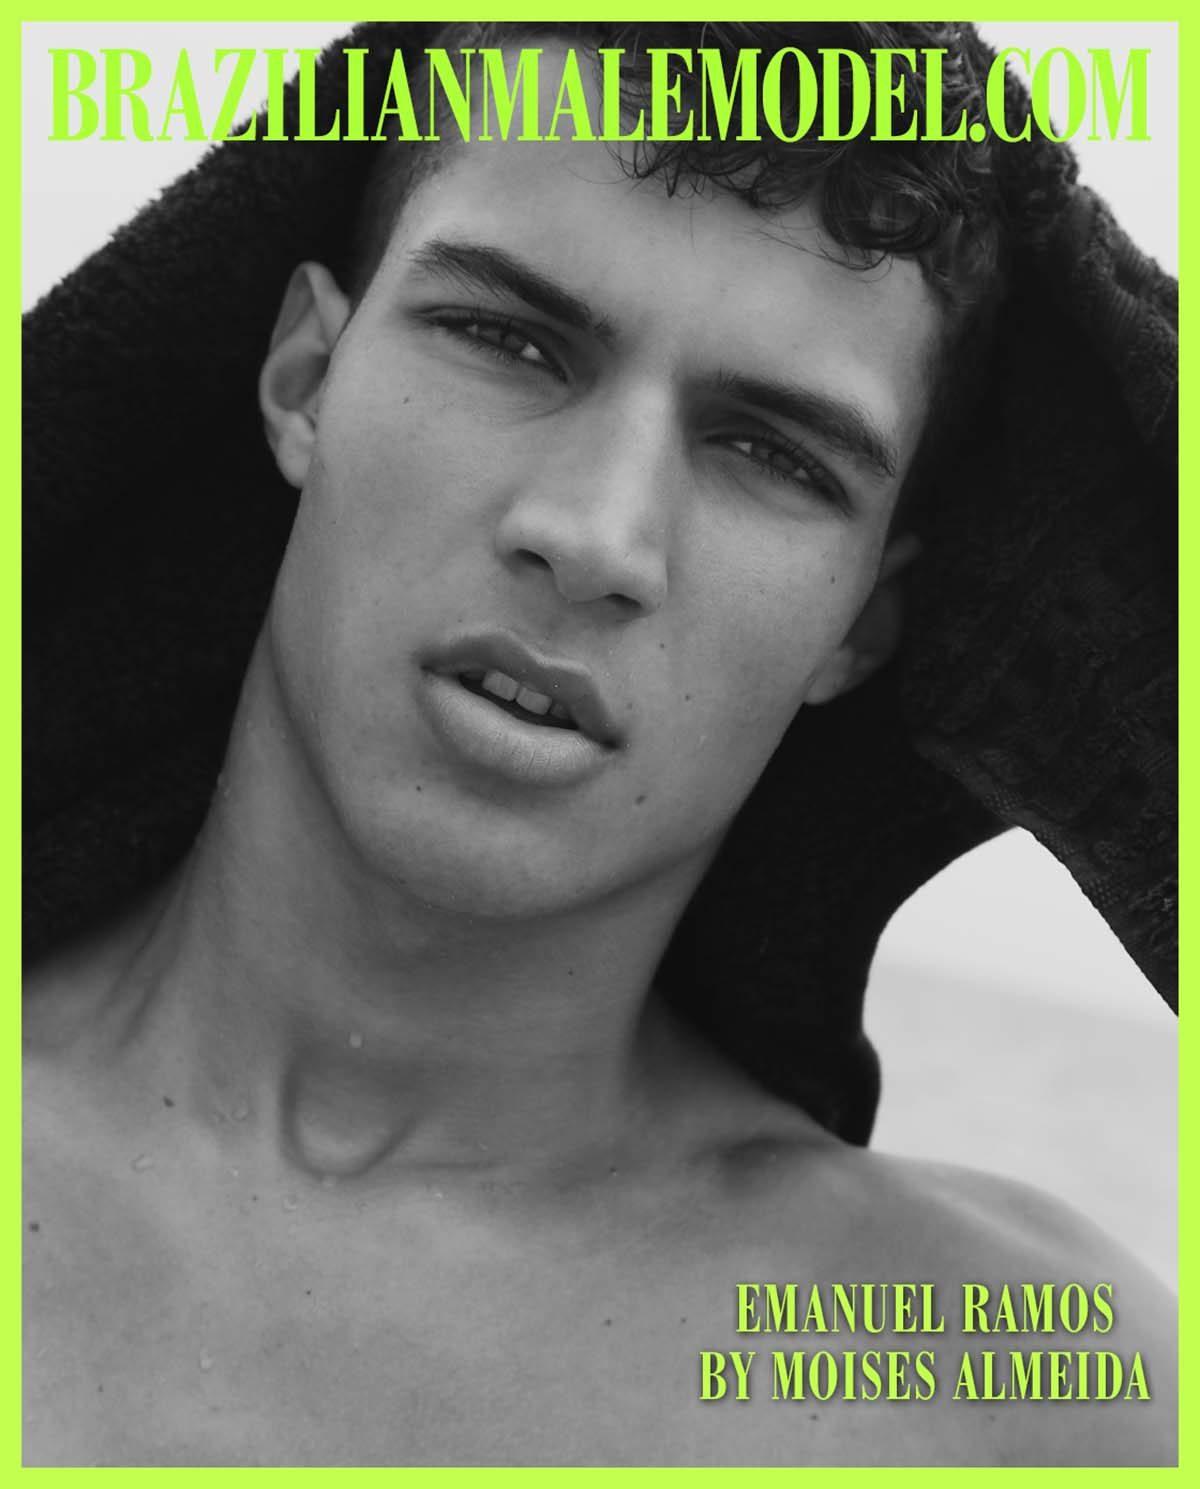 Emanuel Ramos by Moises Almeida